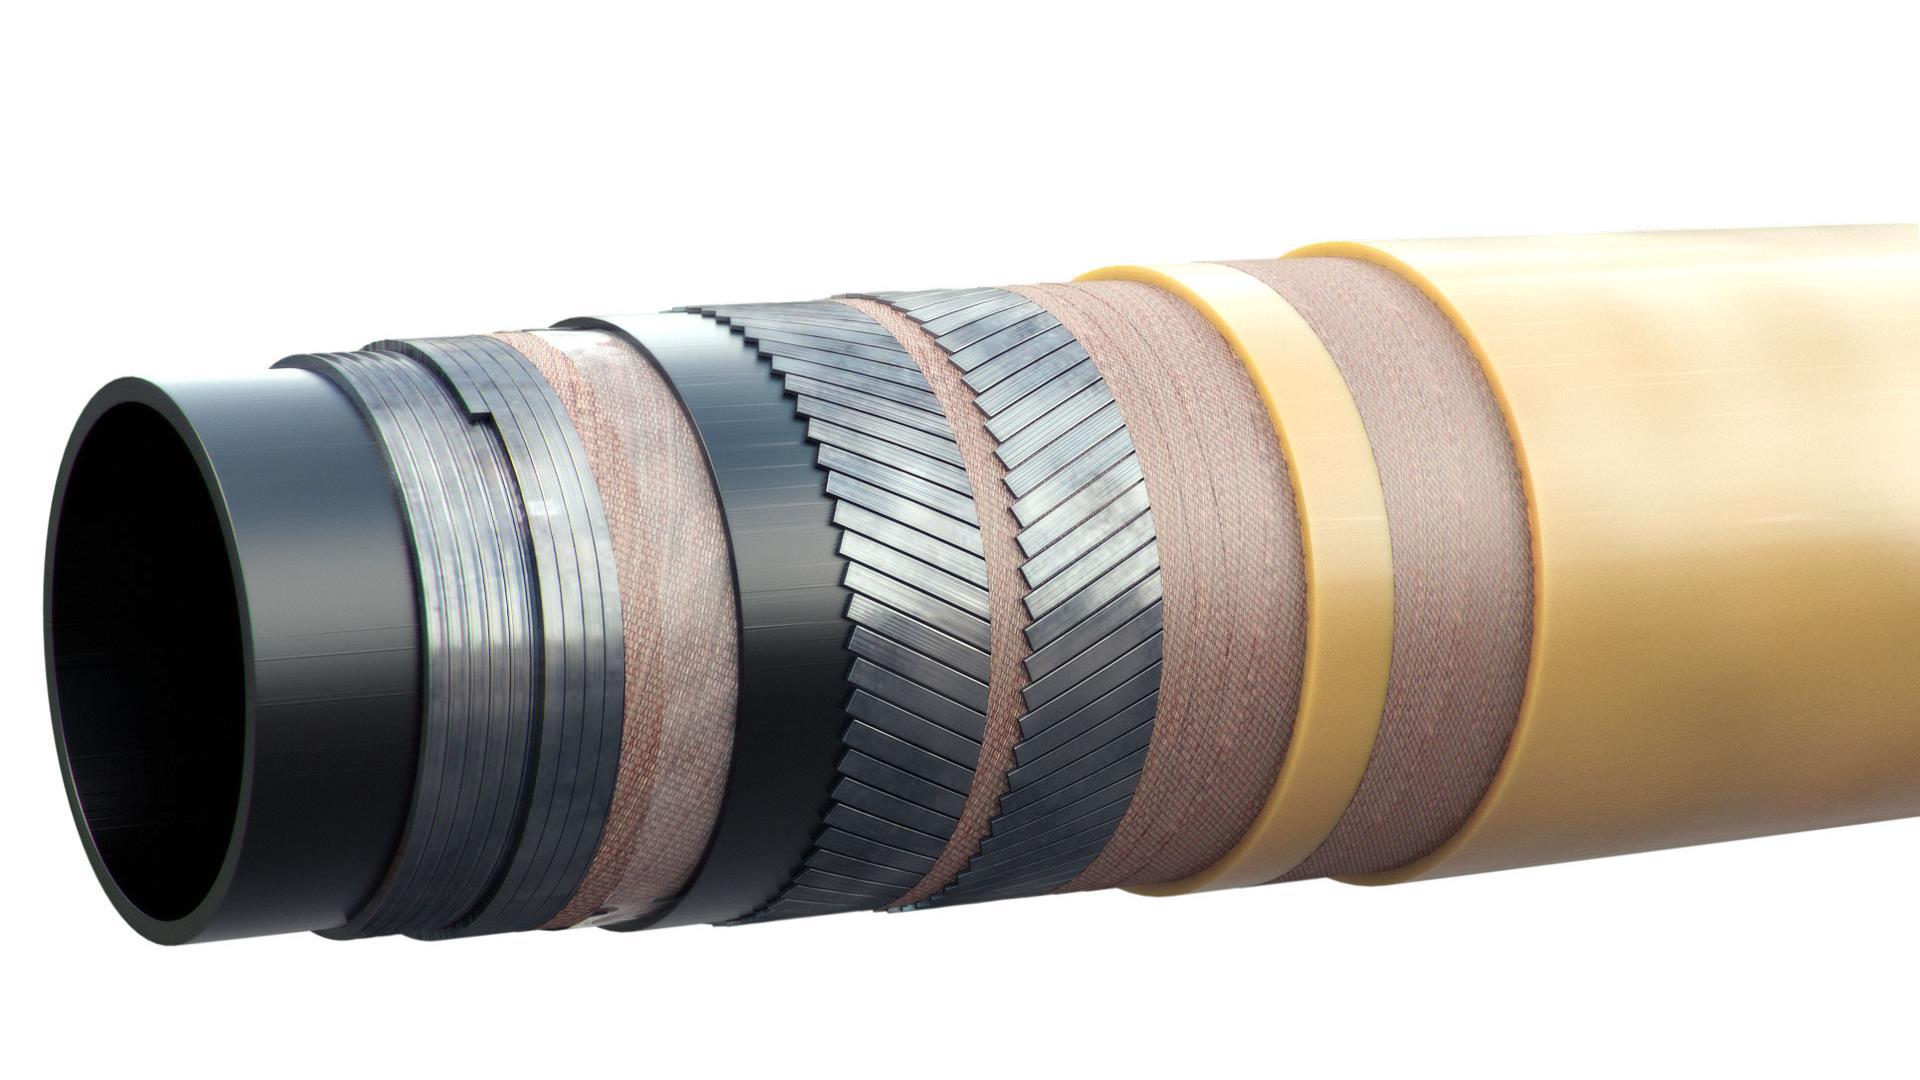 Flexibles AQFlex smooth bore pipe